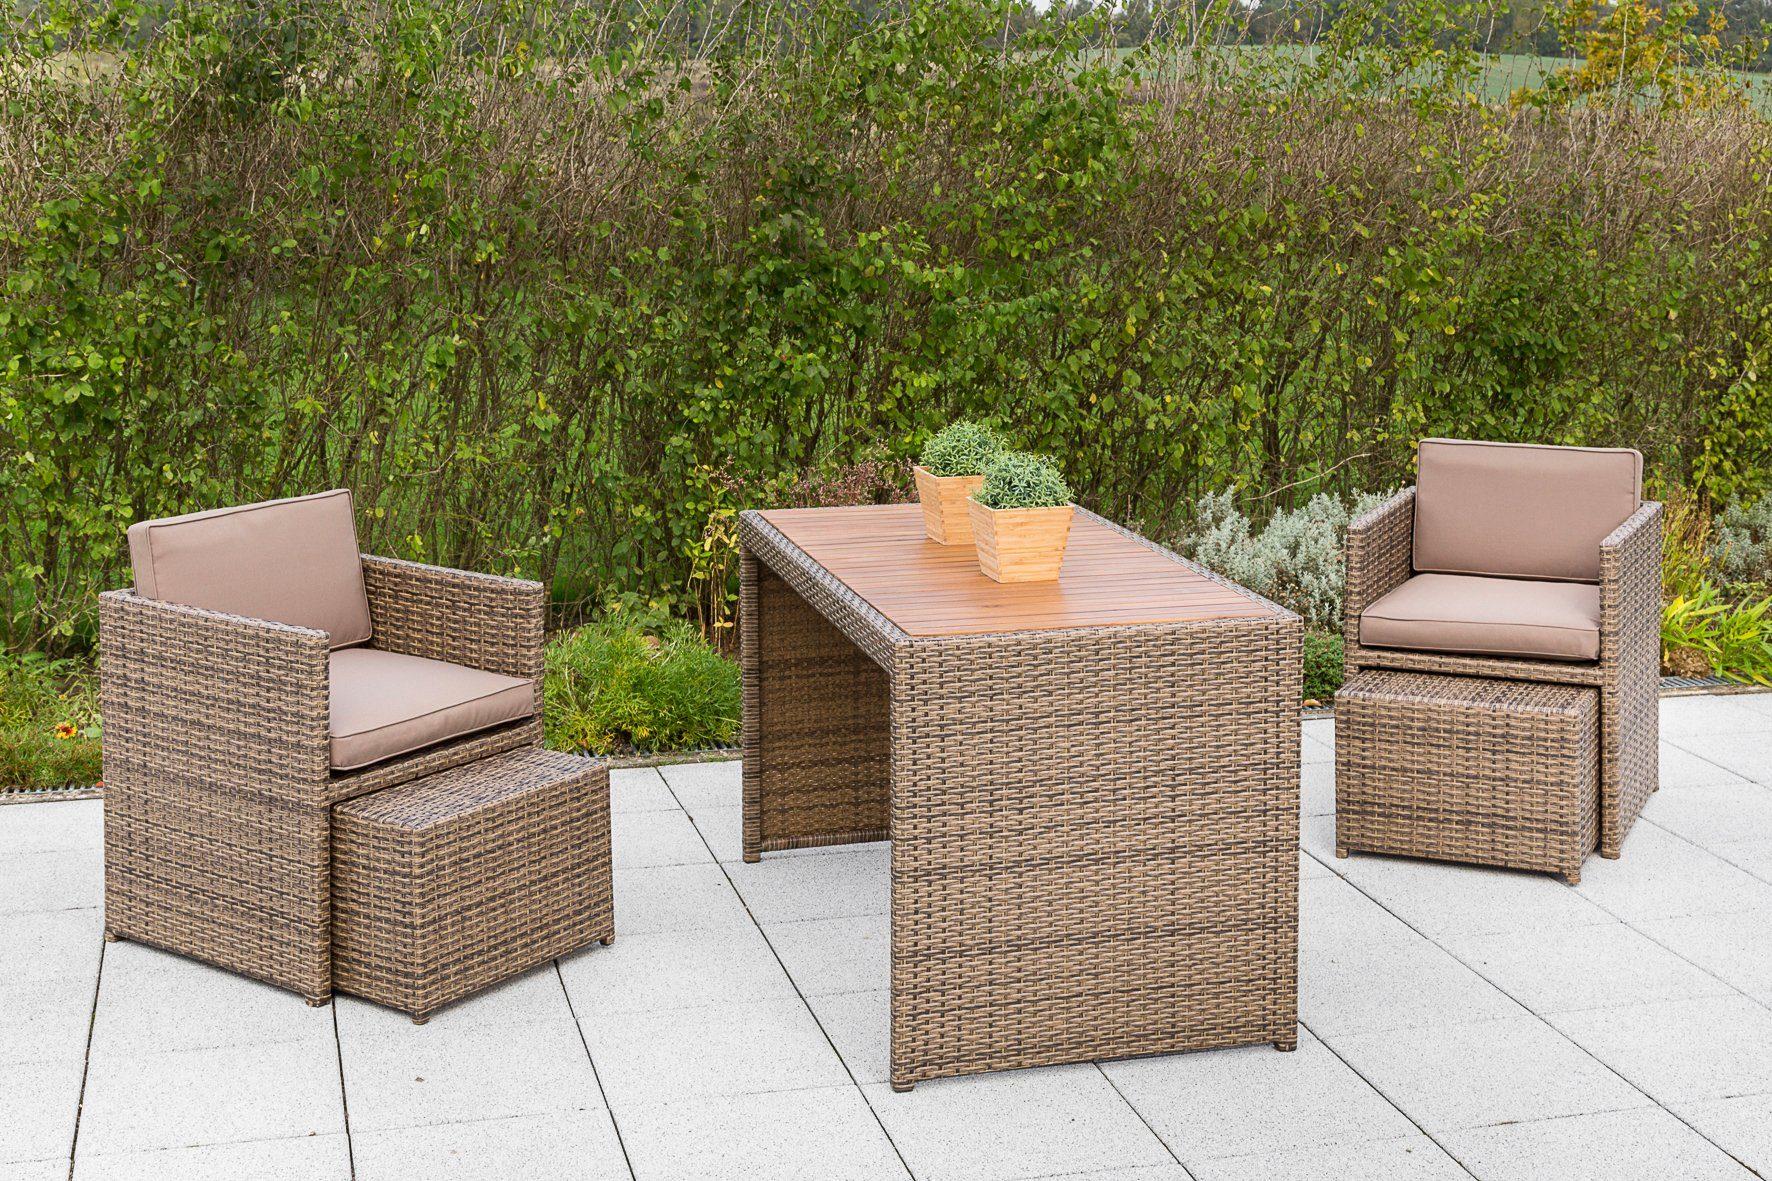 Gartenmöbelset »Merano Wicker«, 9-tlg., 2 Sessel, 2 Hocker, Tisch 69x127 cm, Polyrattan